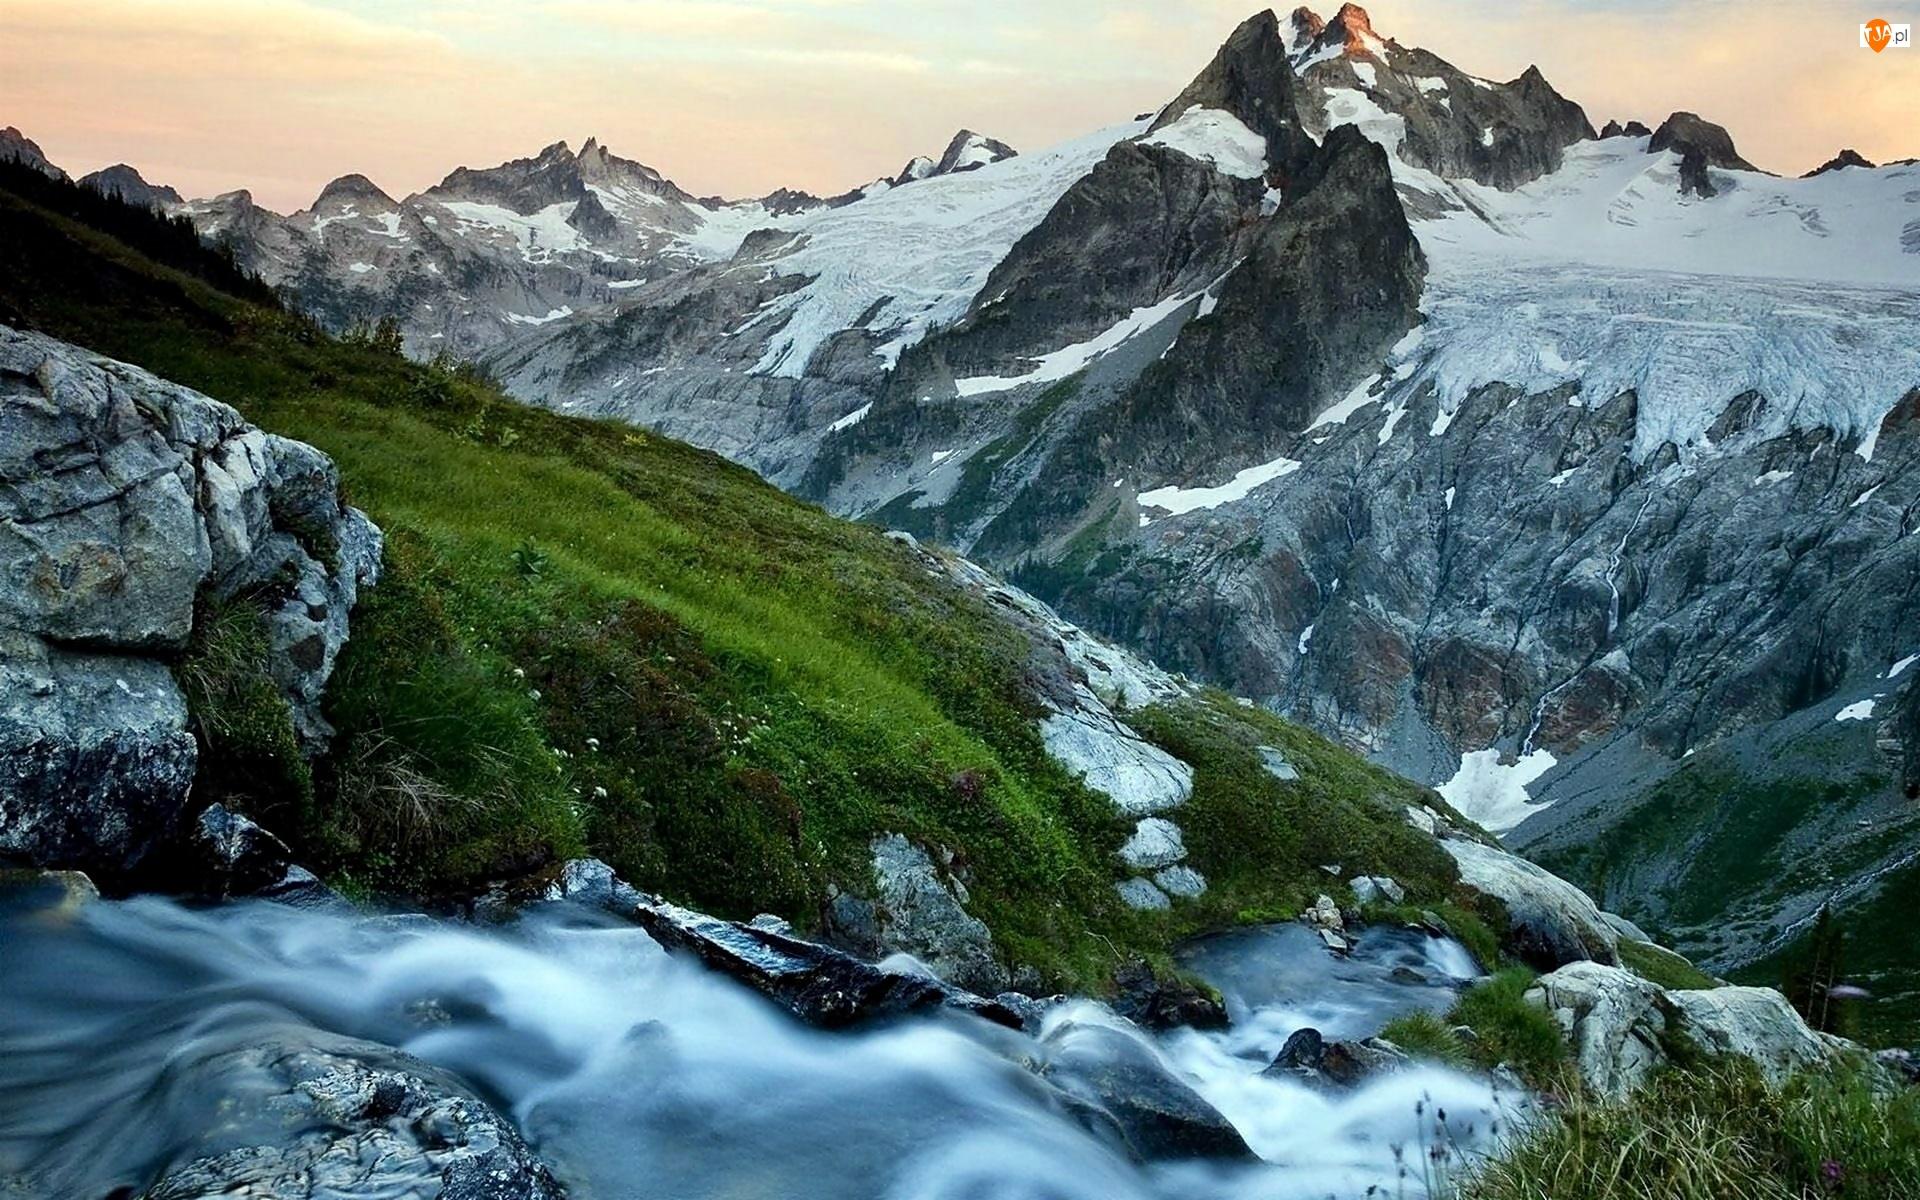 Lodowiec, Łąka, Patagonia, Potok, Góry, Kanion